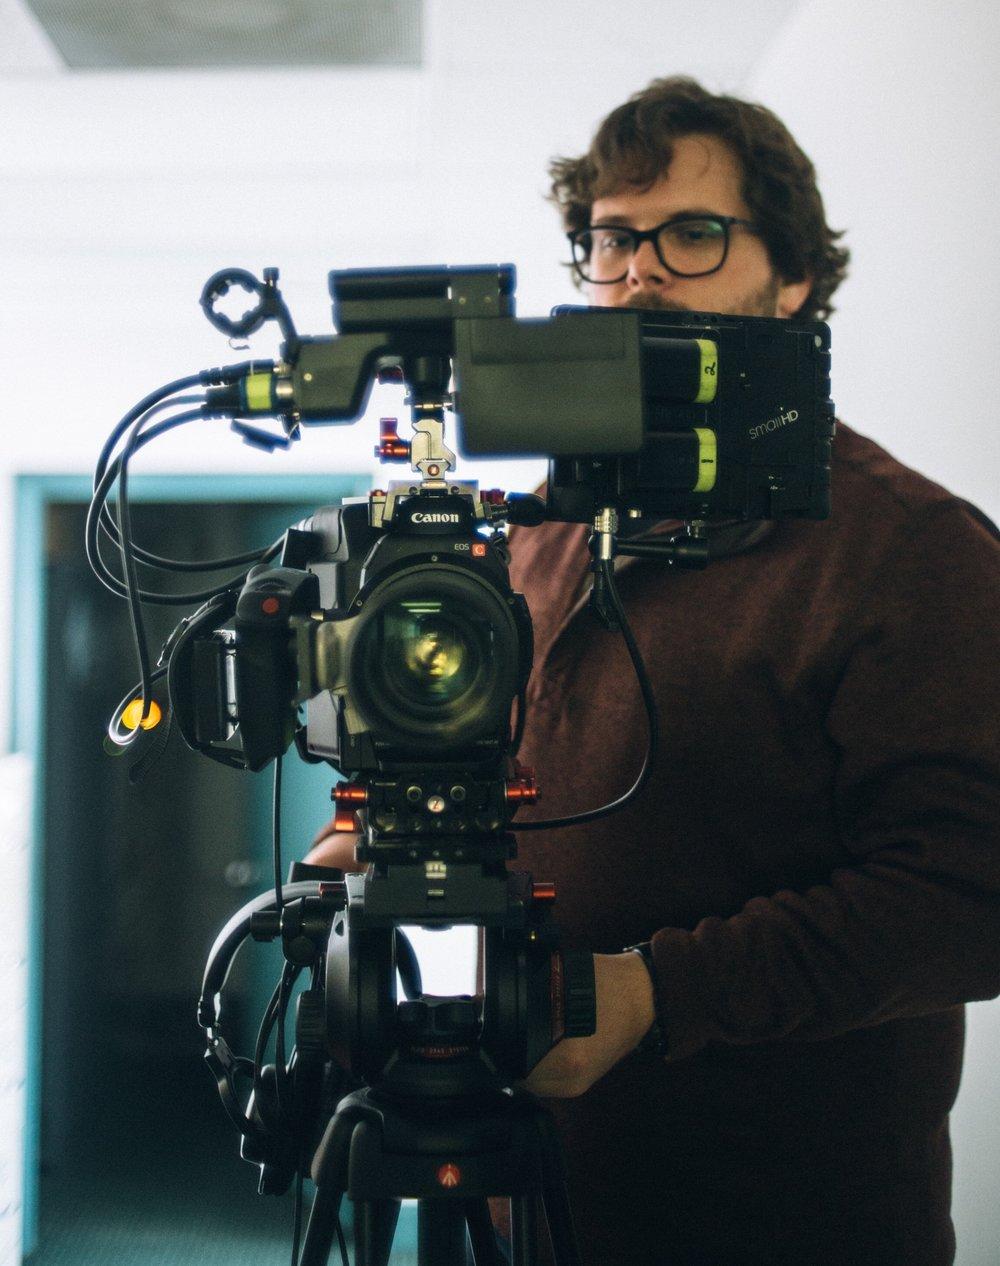 eliott acevedo pittsburgh videographer videography video production i m eliott acevedo i m a producer videographer and editor in pittsburgh pennsylvania